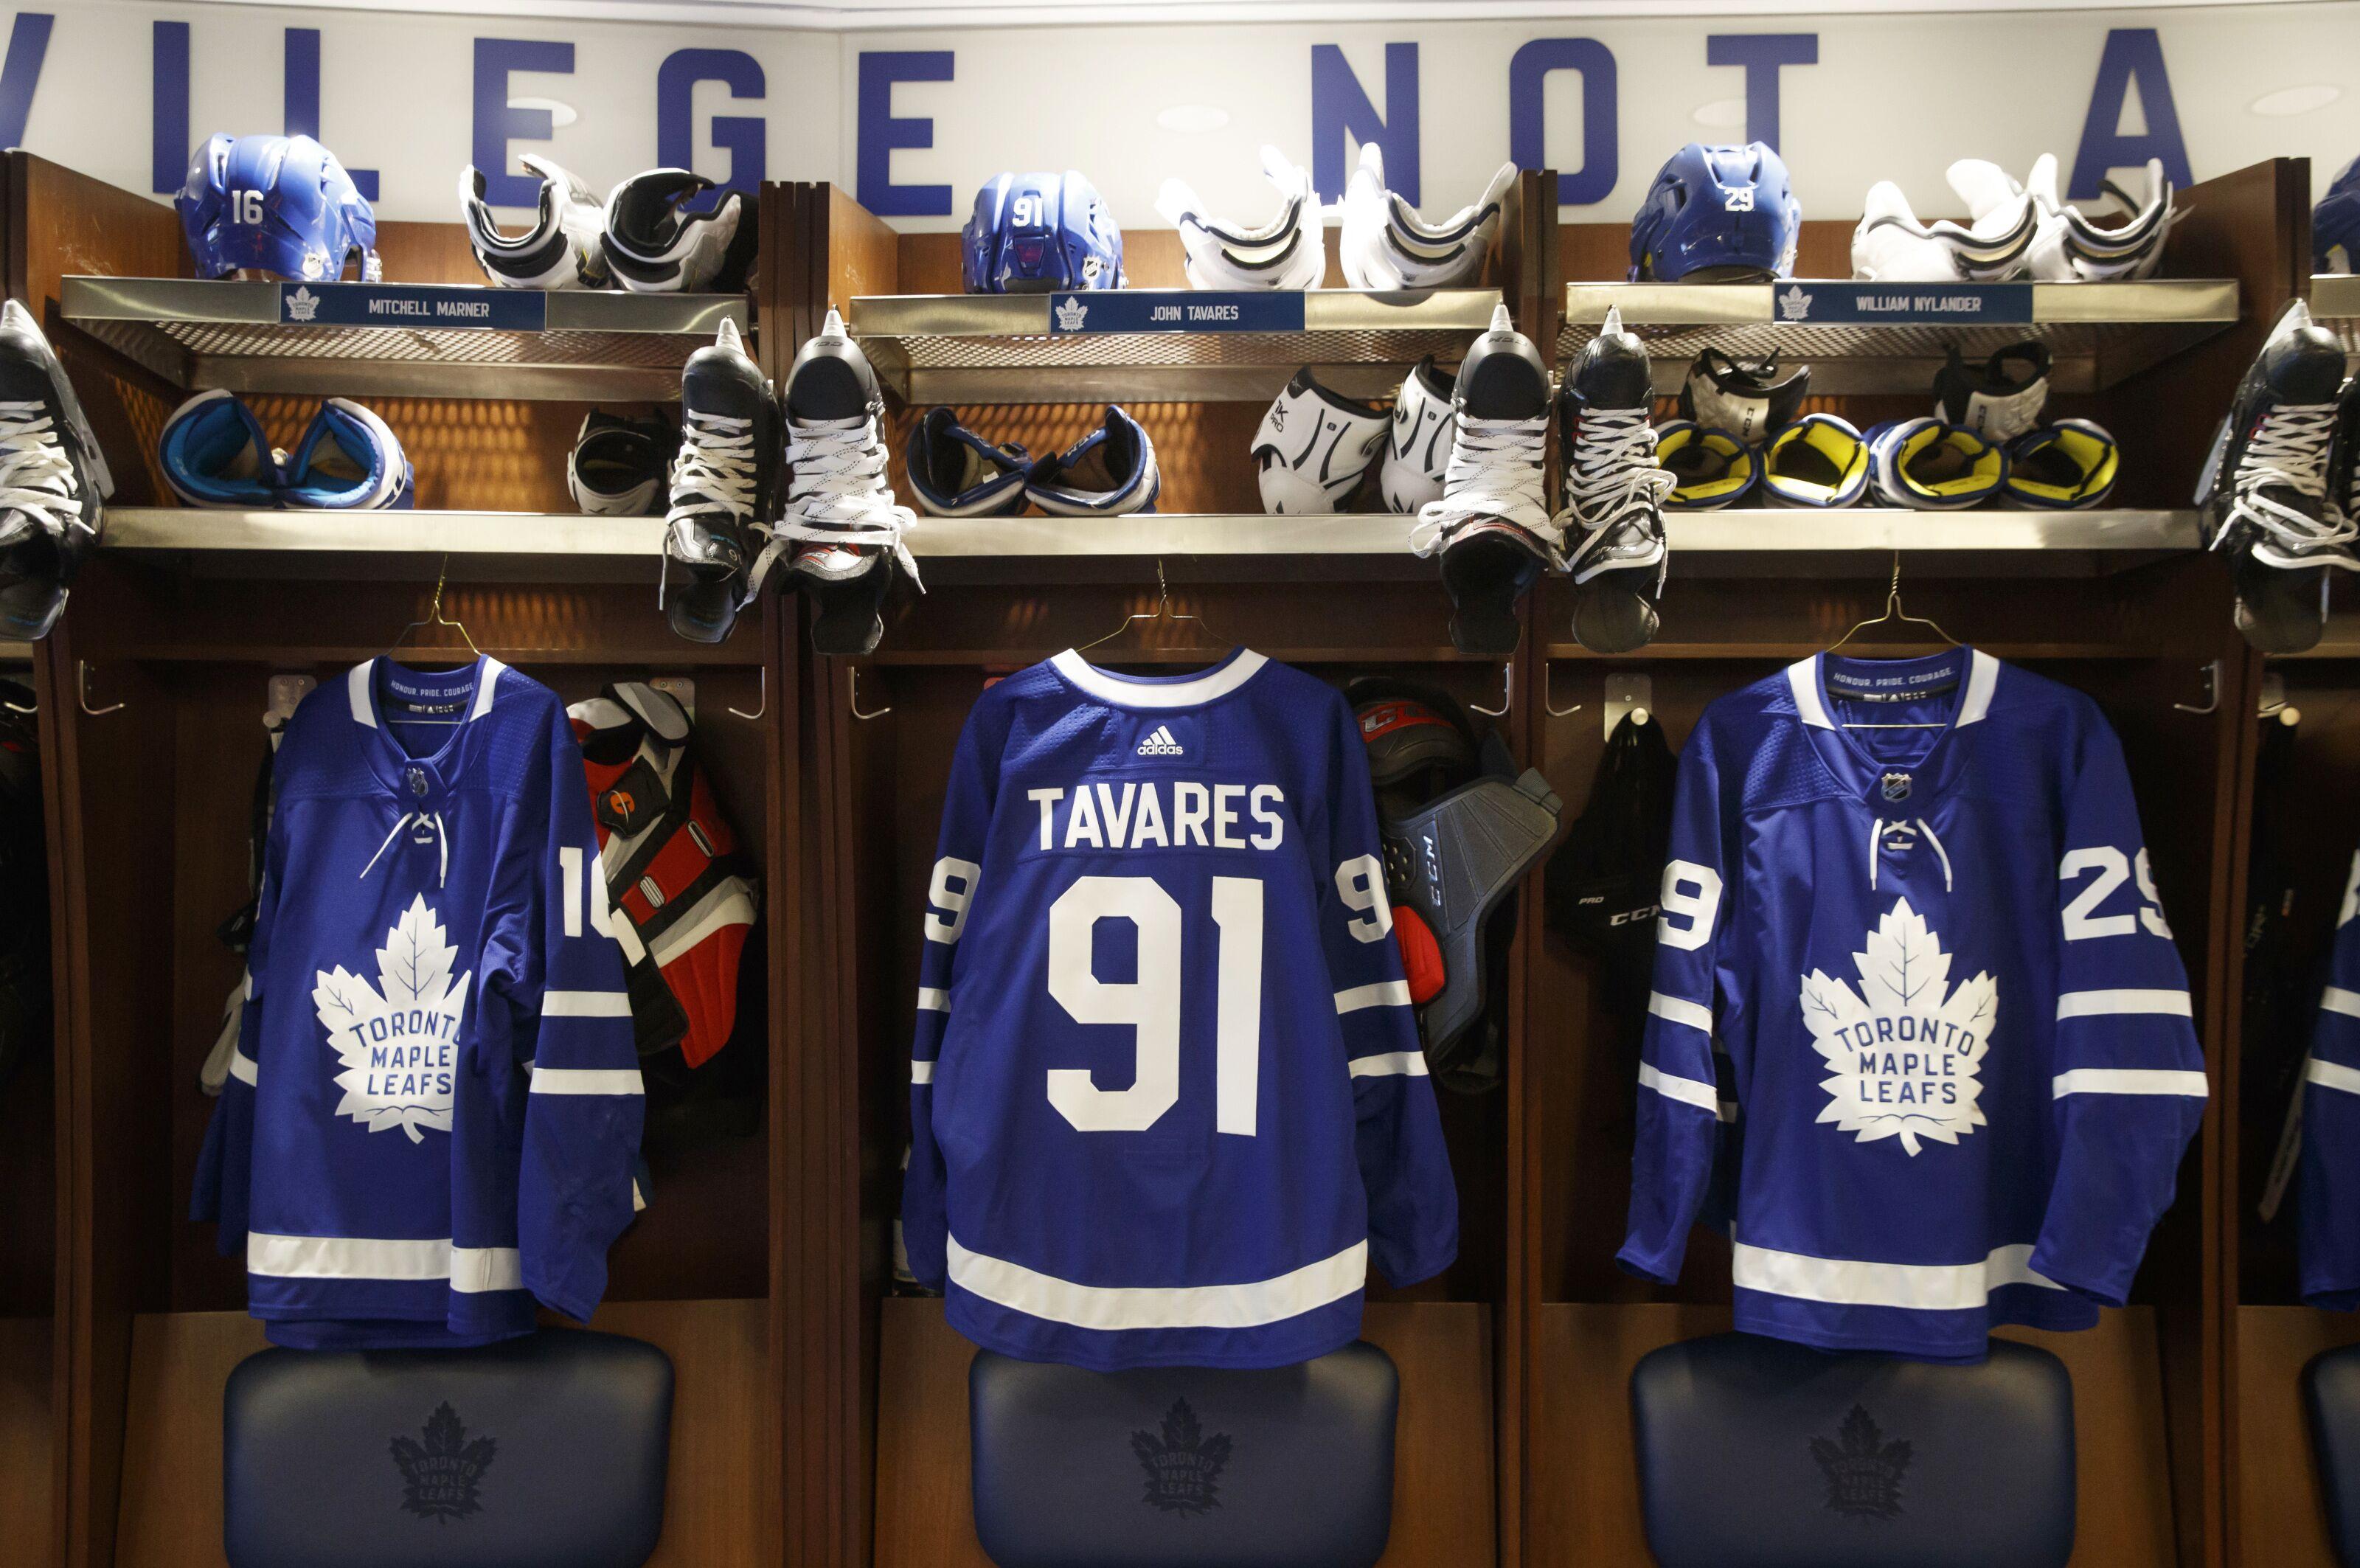 huge sale 21f0e b9301 Toronto Maple Leafs: Yes, John Tavares Is Still A Leaf